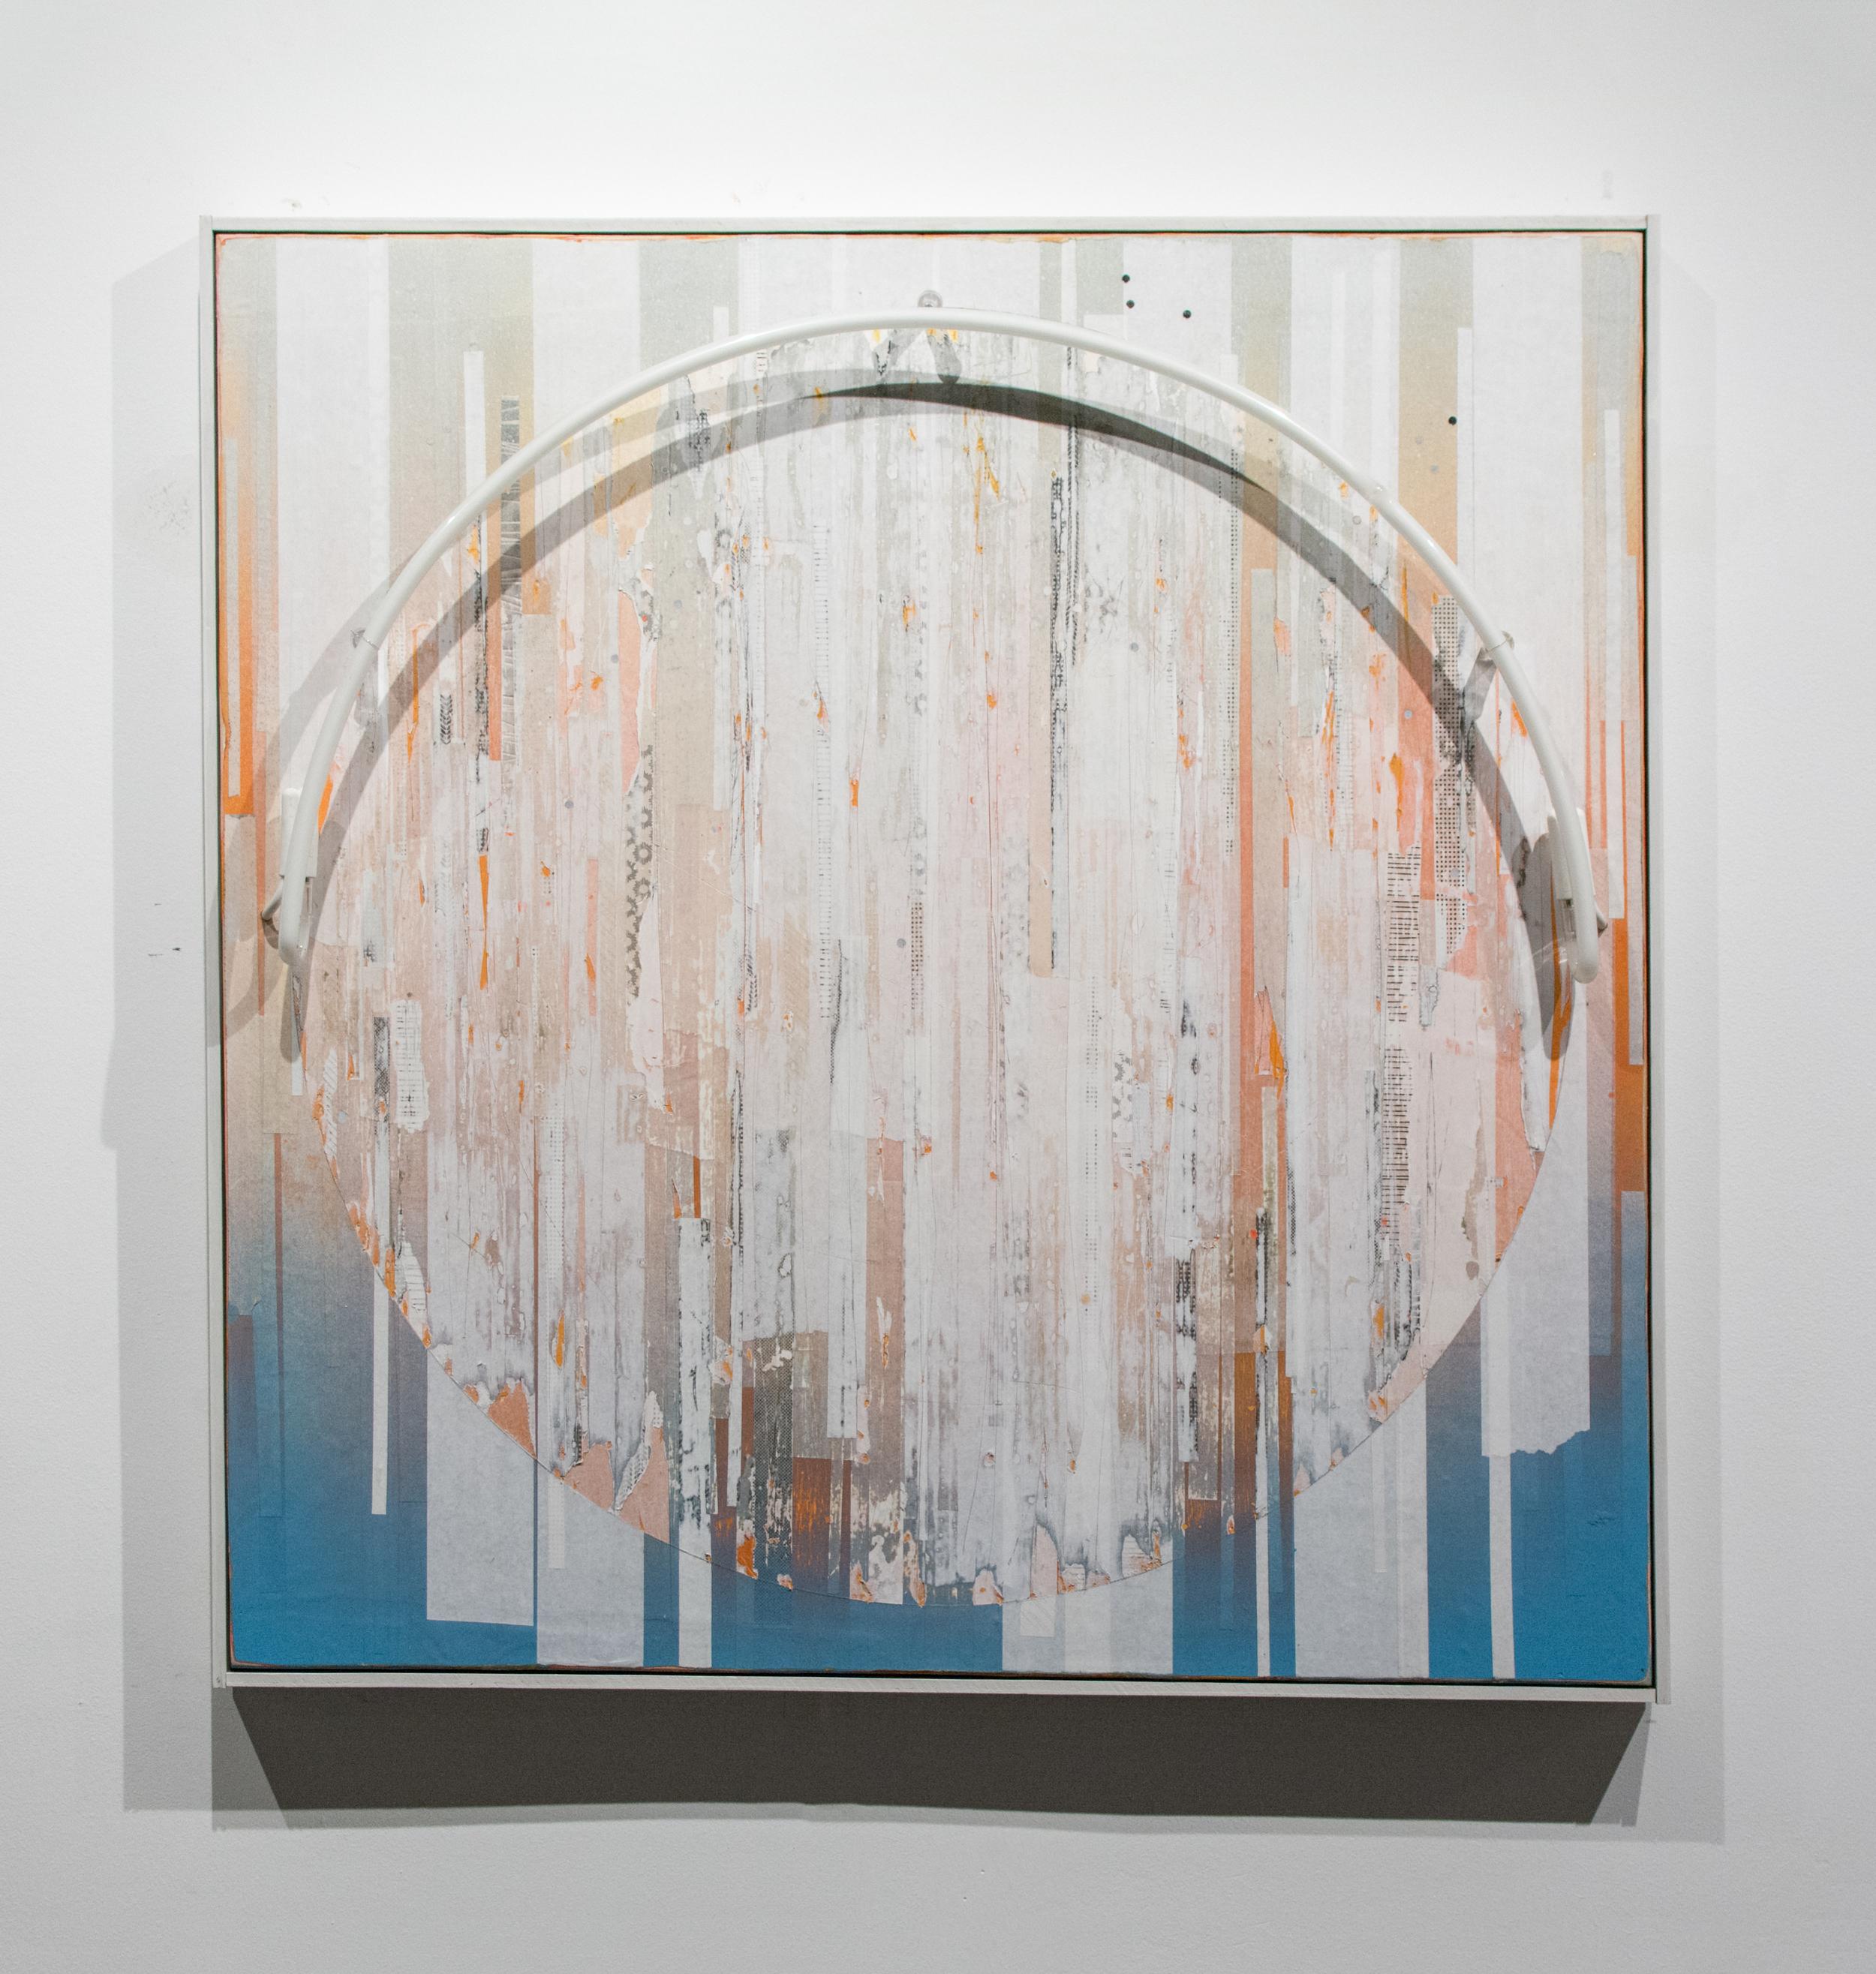 Erik Otto, Luminance, 2016. Enamel, acrylic, spray paint, paper and neon light on panel. 40 x 40 in.